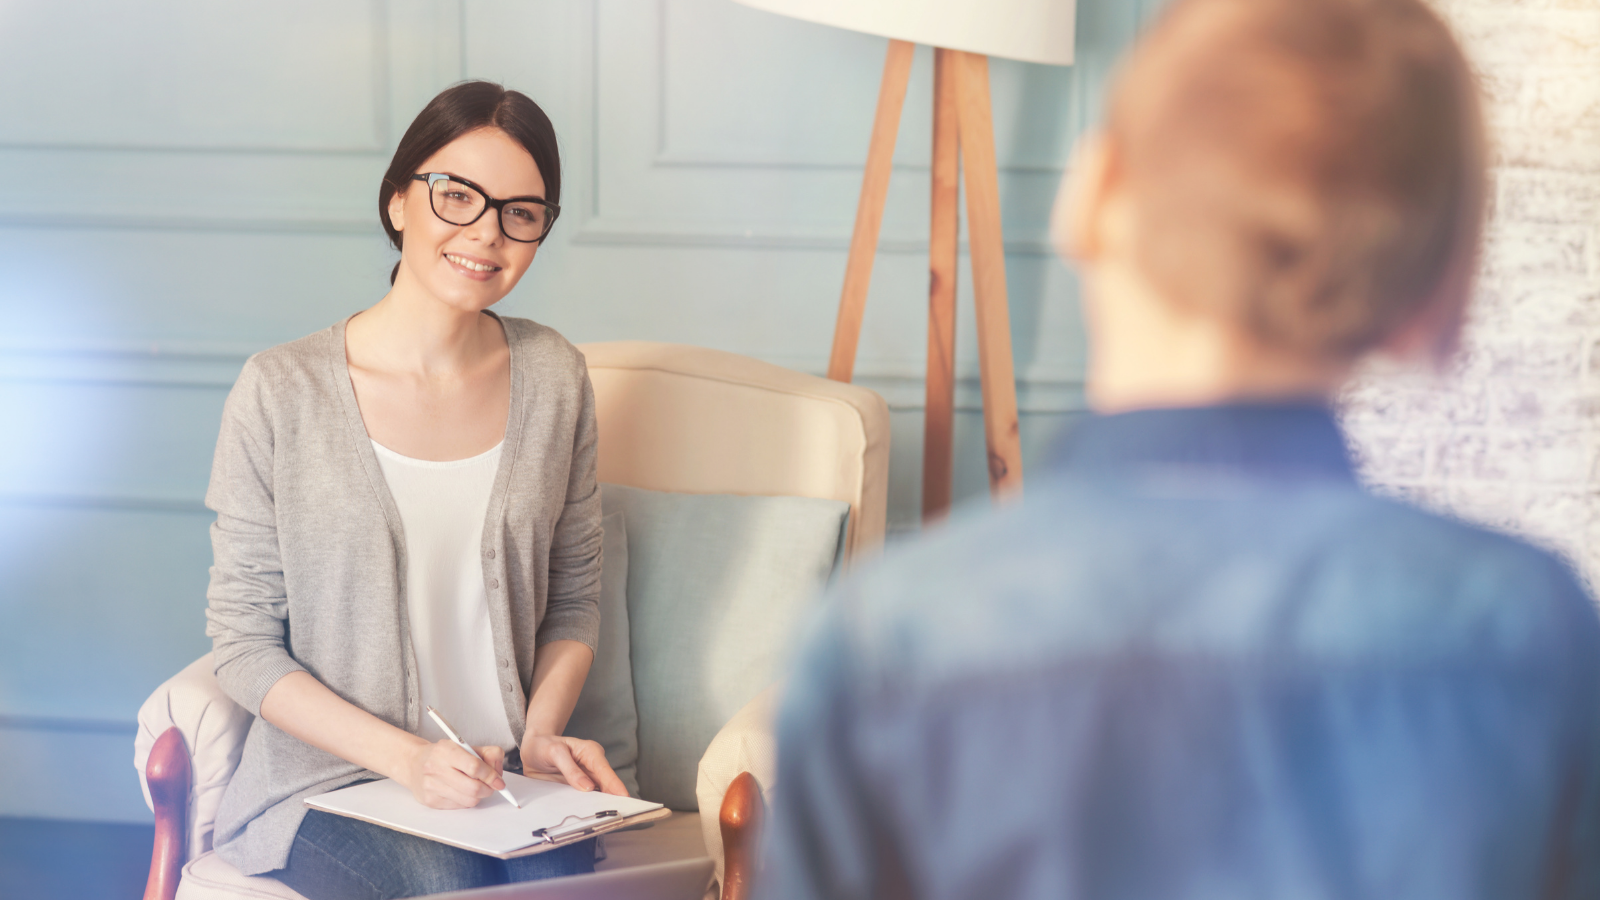 Psicologia: Saiba quando procurar ajuda profissional